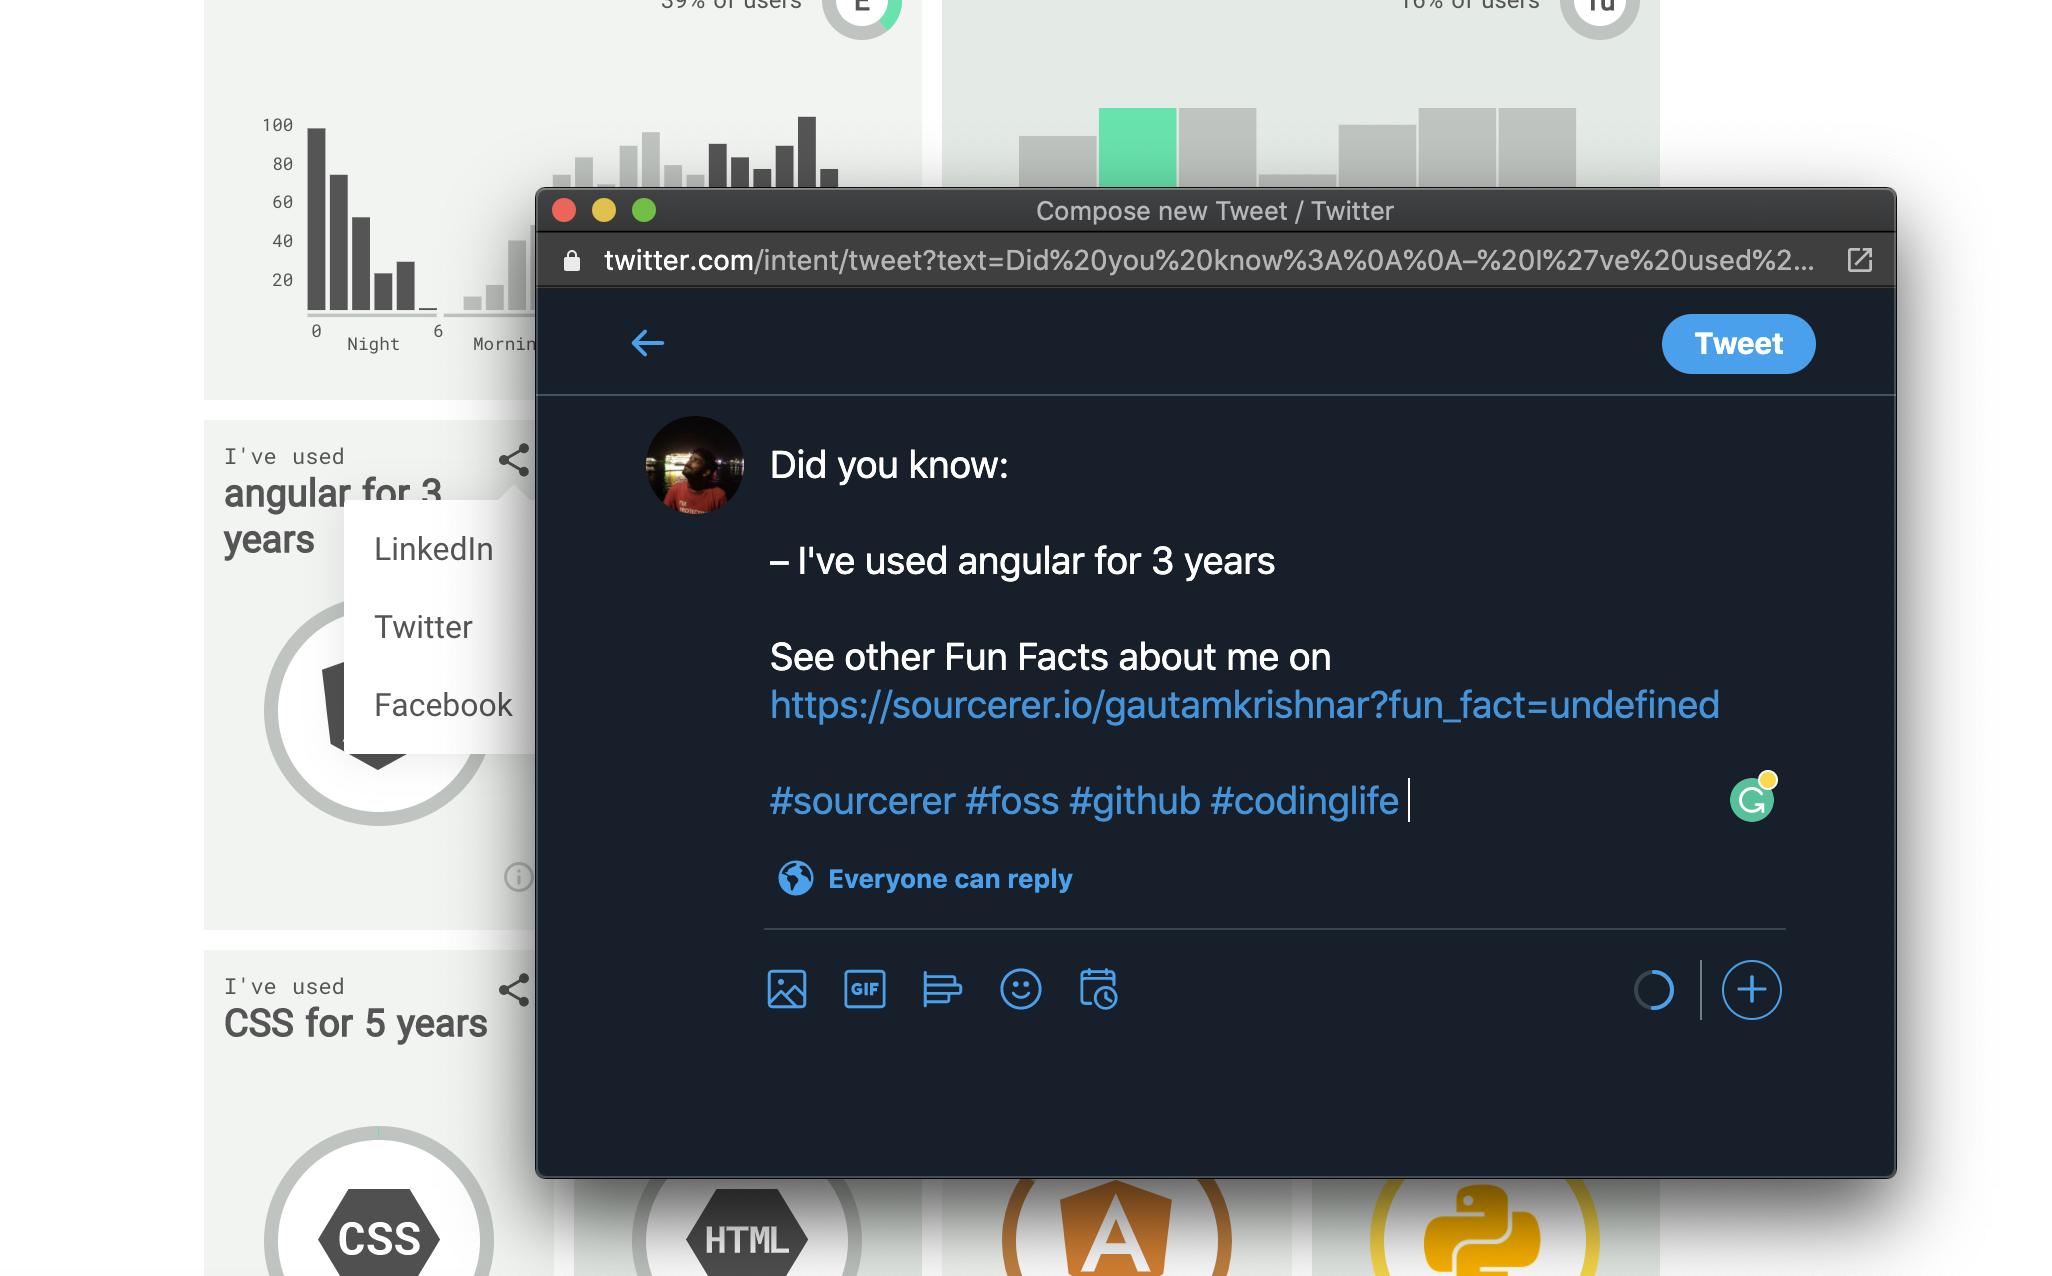 Screenshot 2020-09-01 at 3 45 08 PM